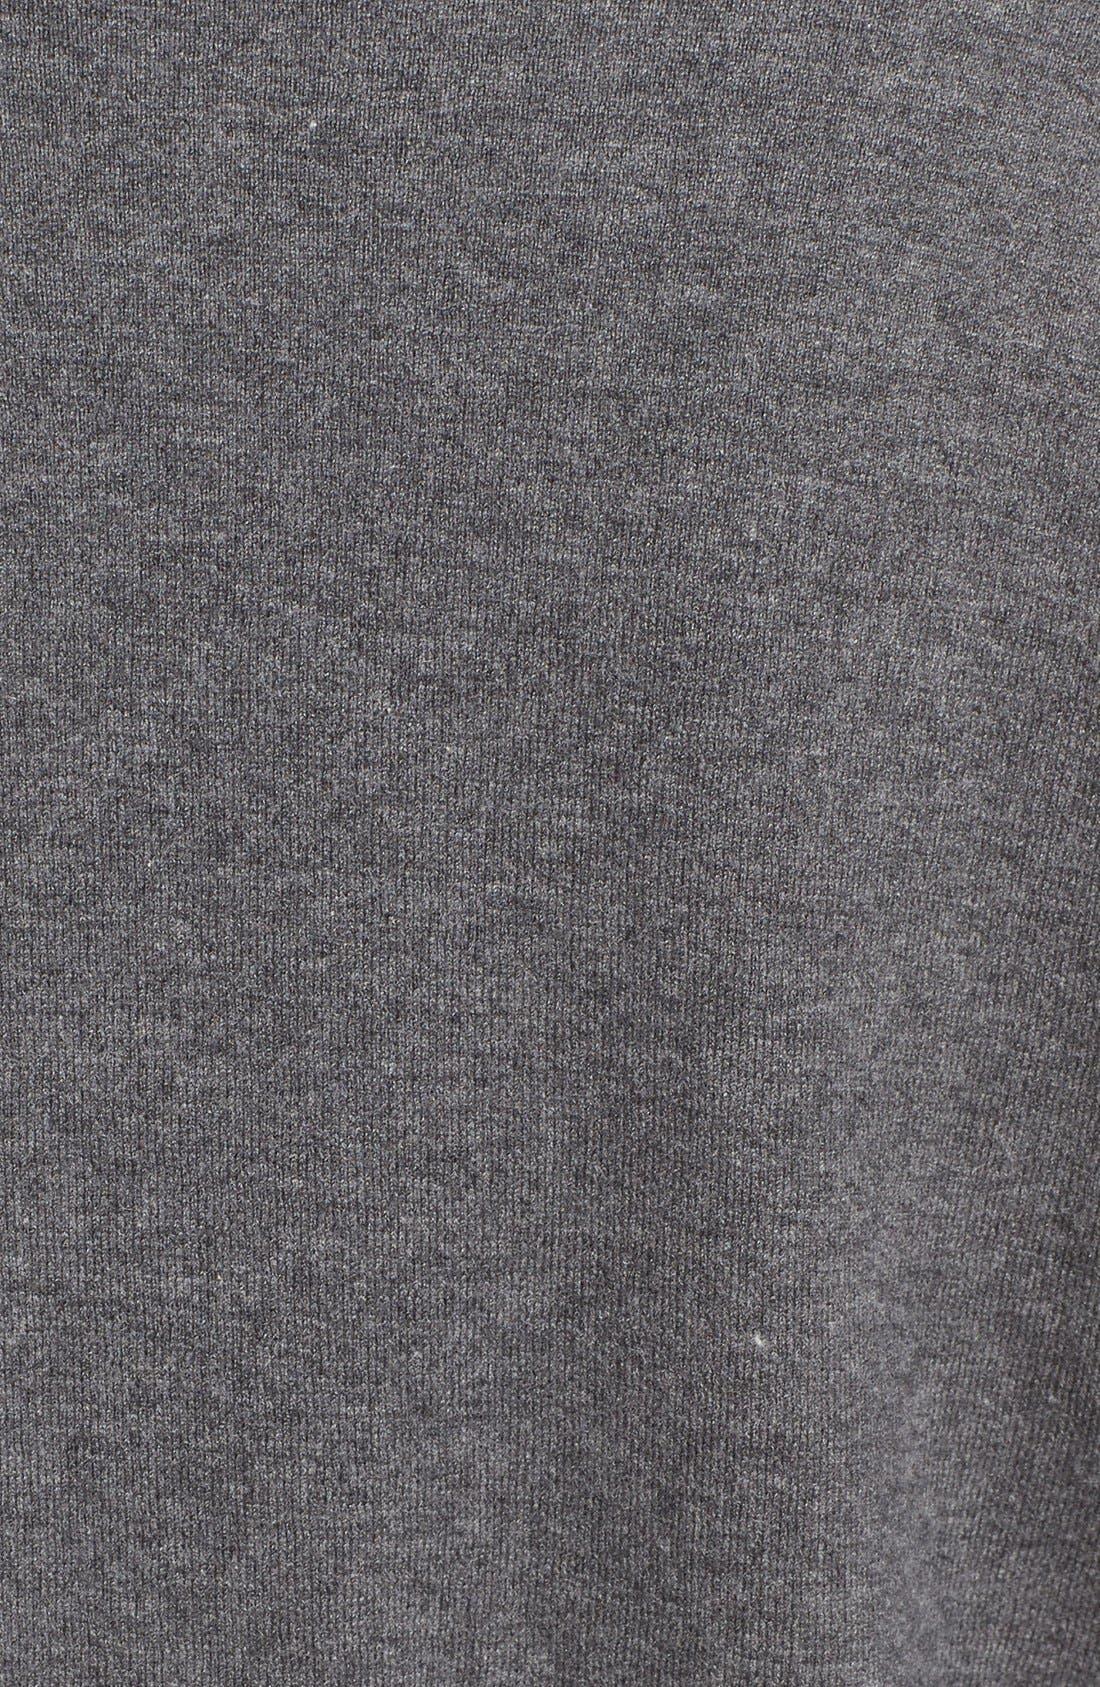 Alternate Image 3  - Jason Wu Cashmere & Wool Blend Textured Sweater